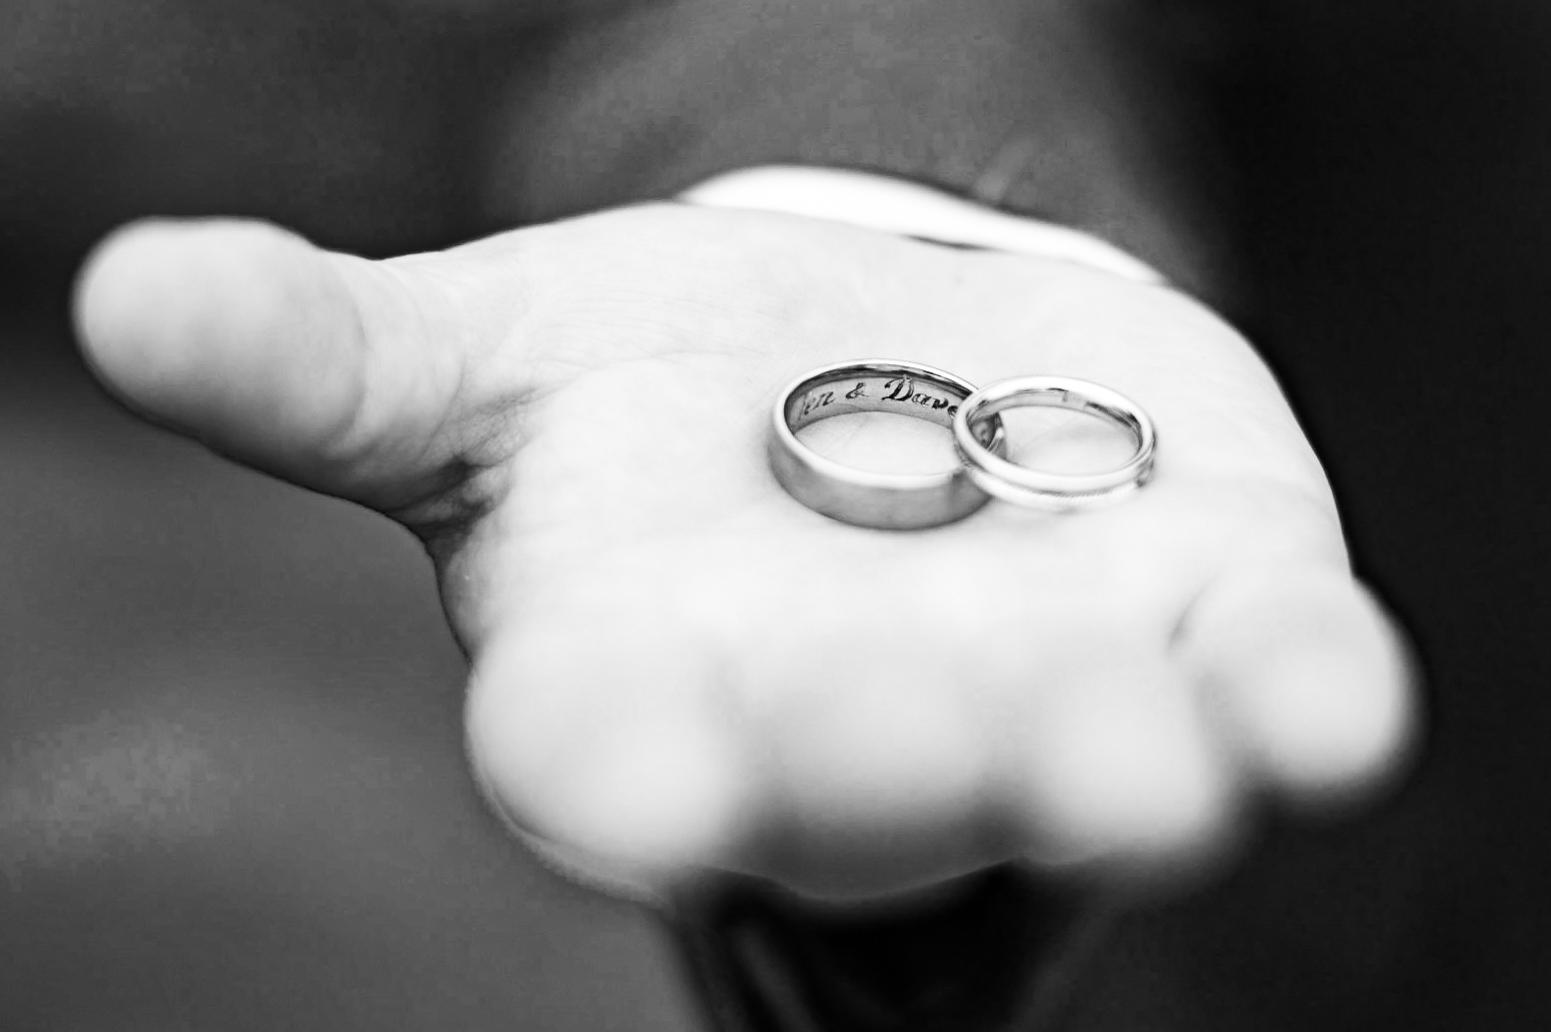 Yup - I got the rings